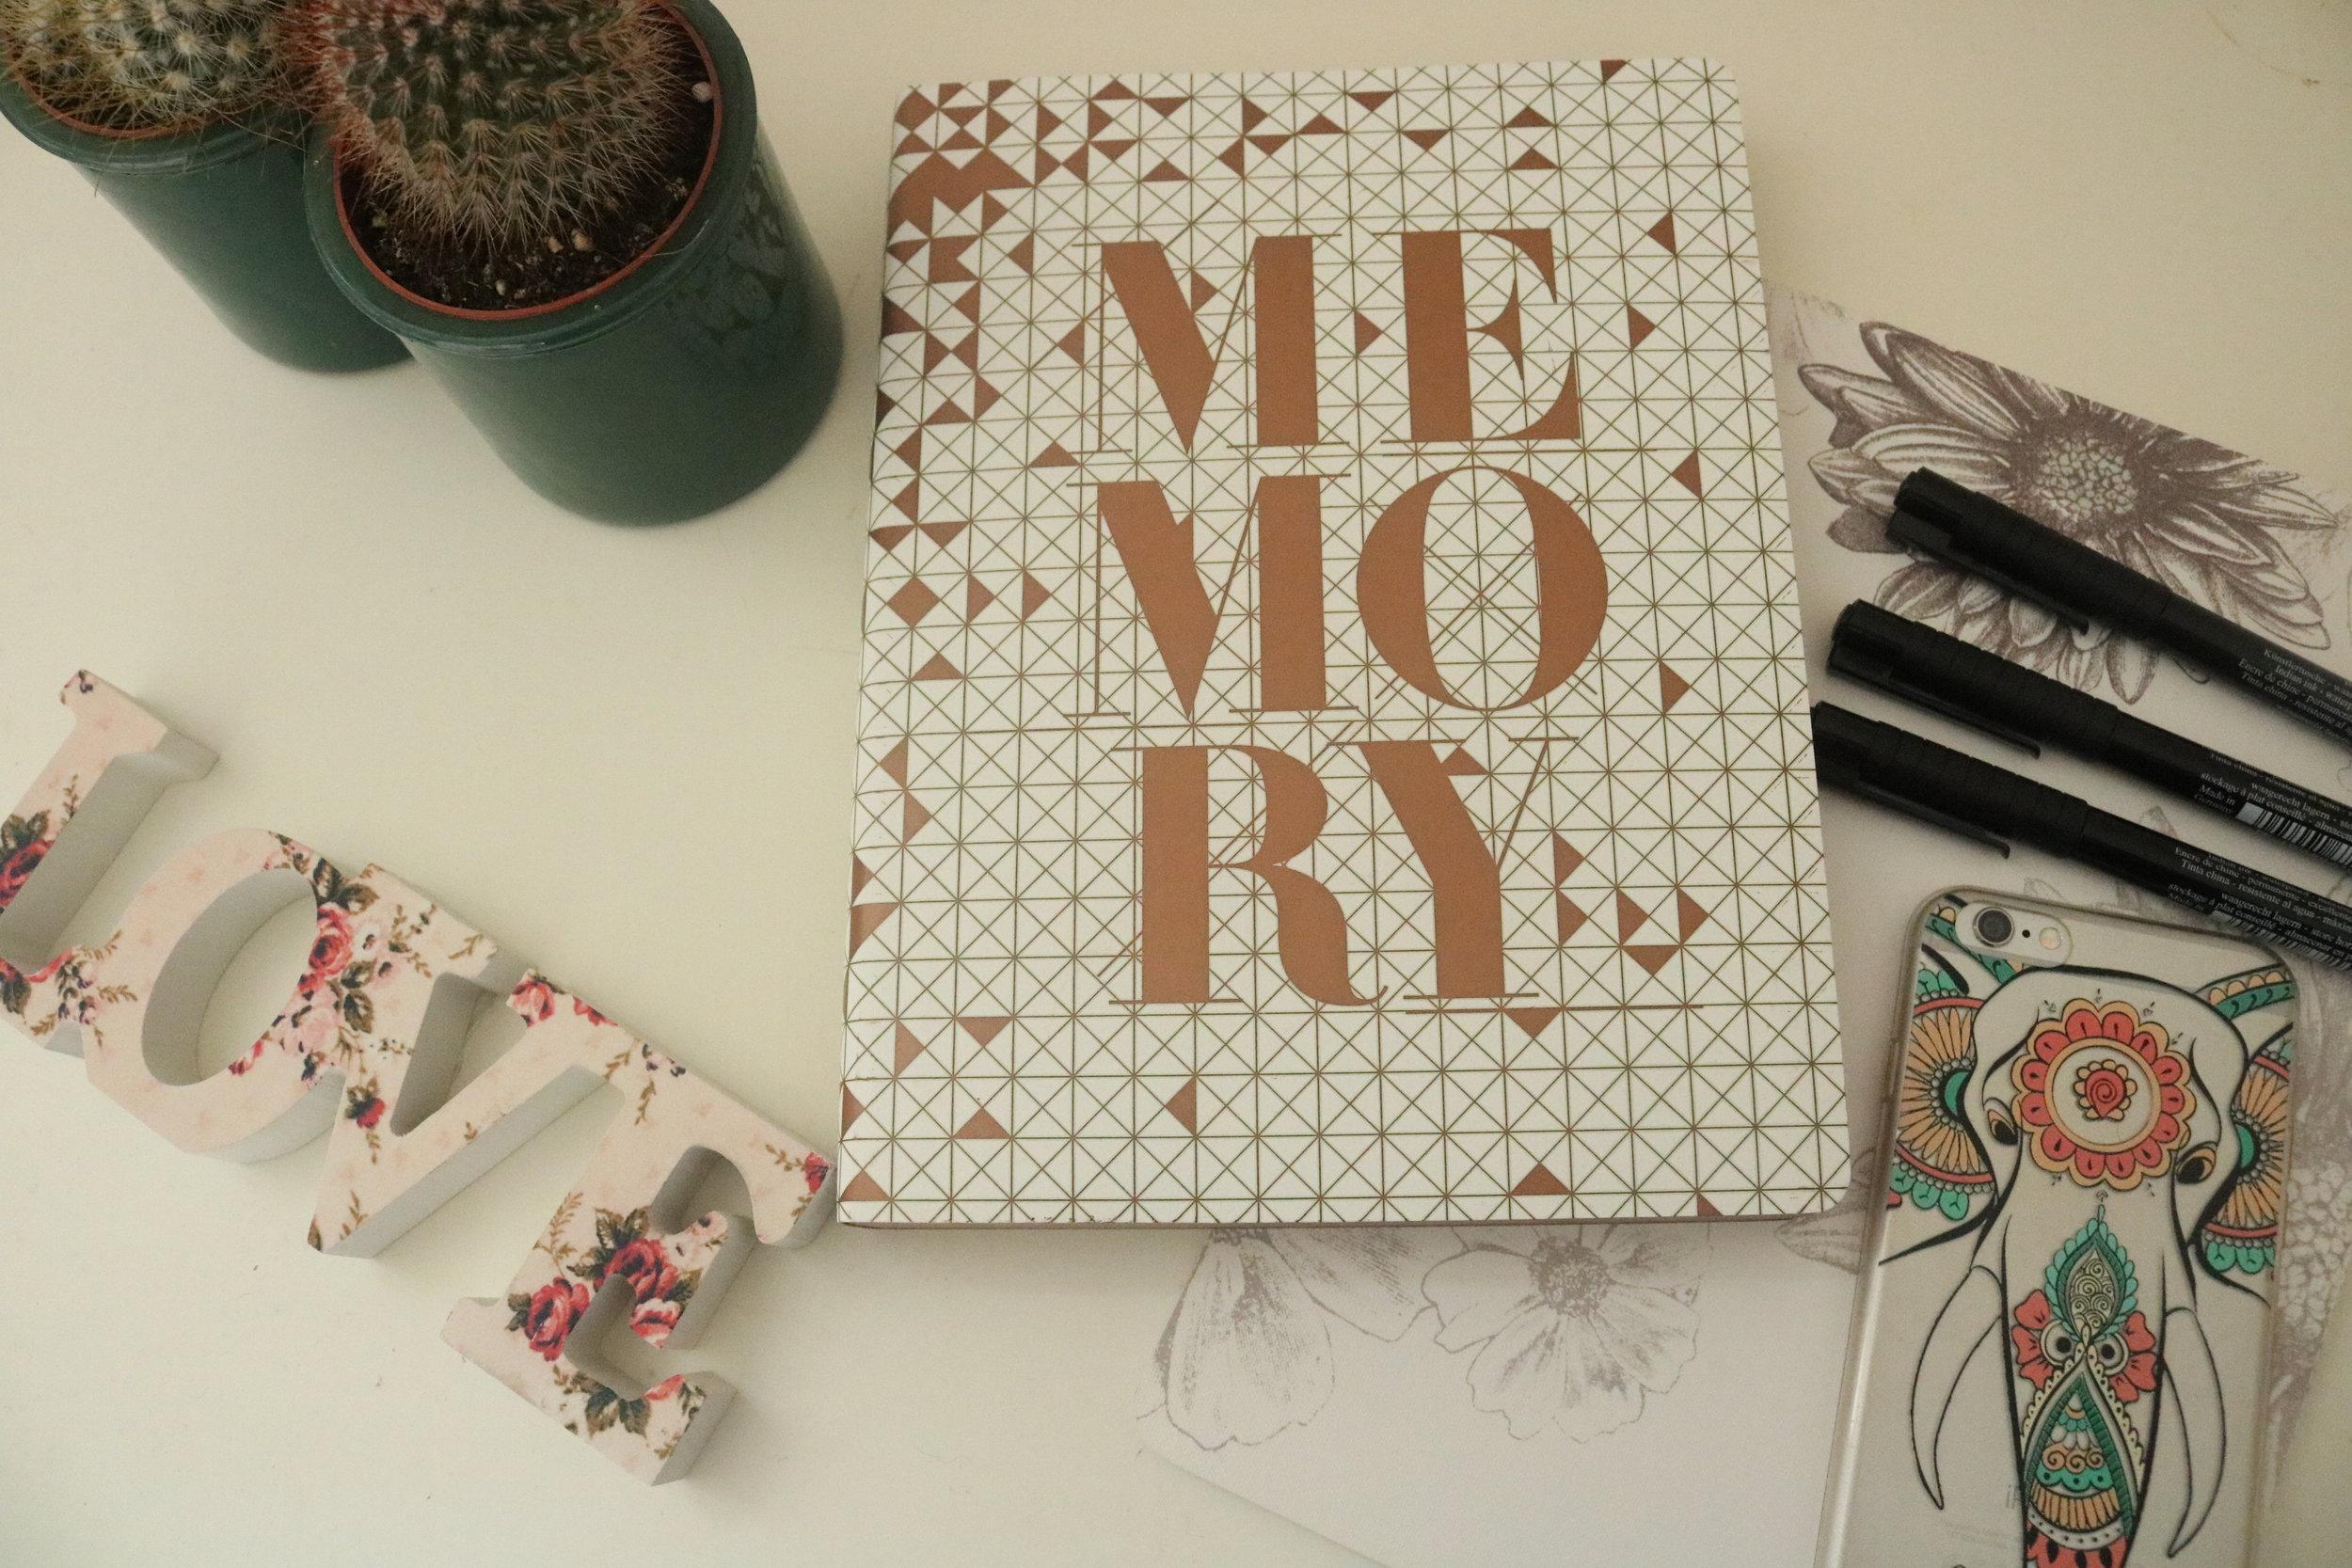 blog post enjoyed recently